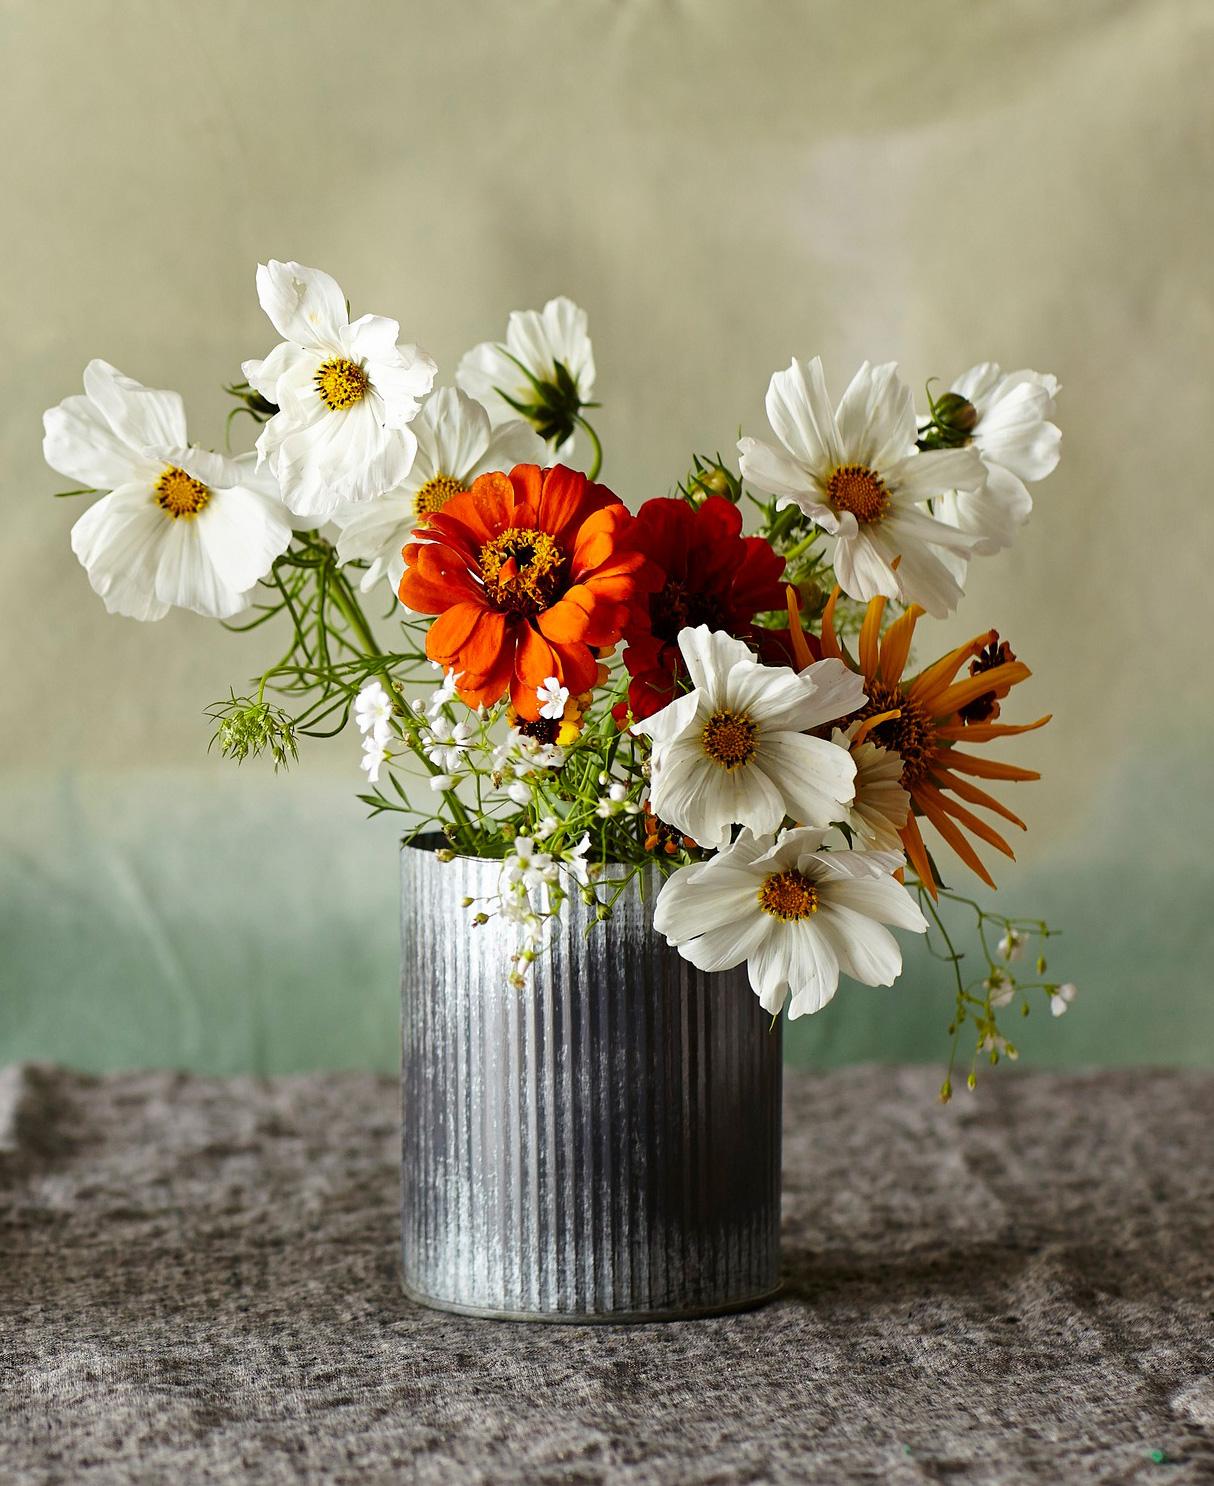 Easy does it flower arrangement